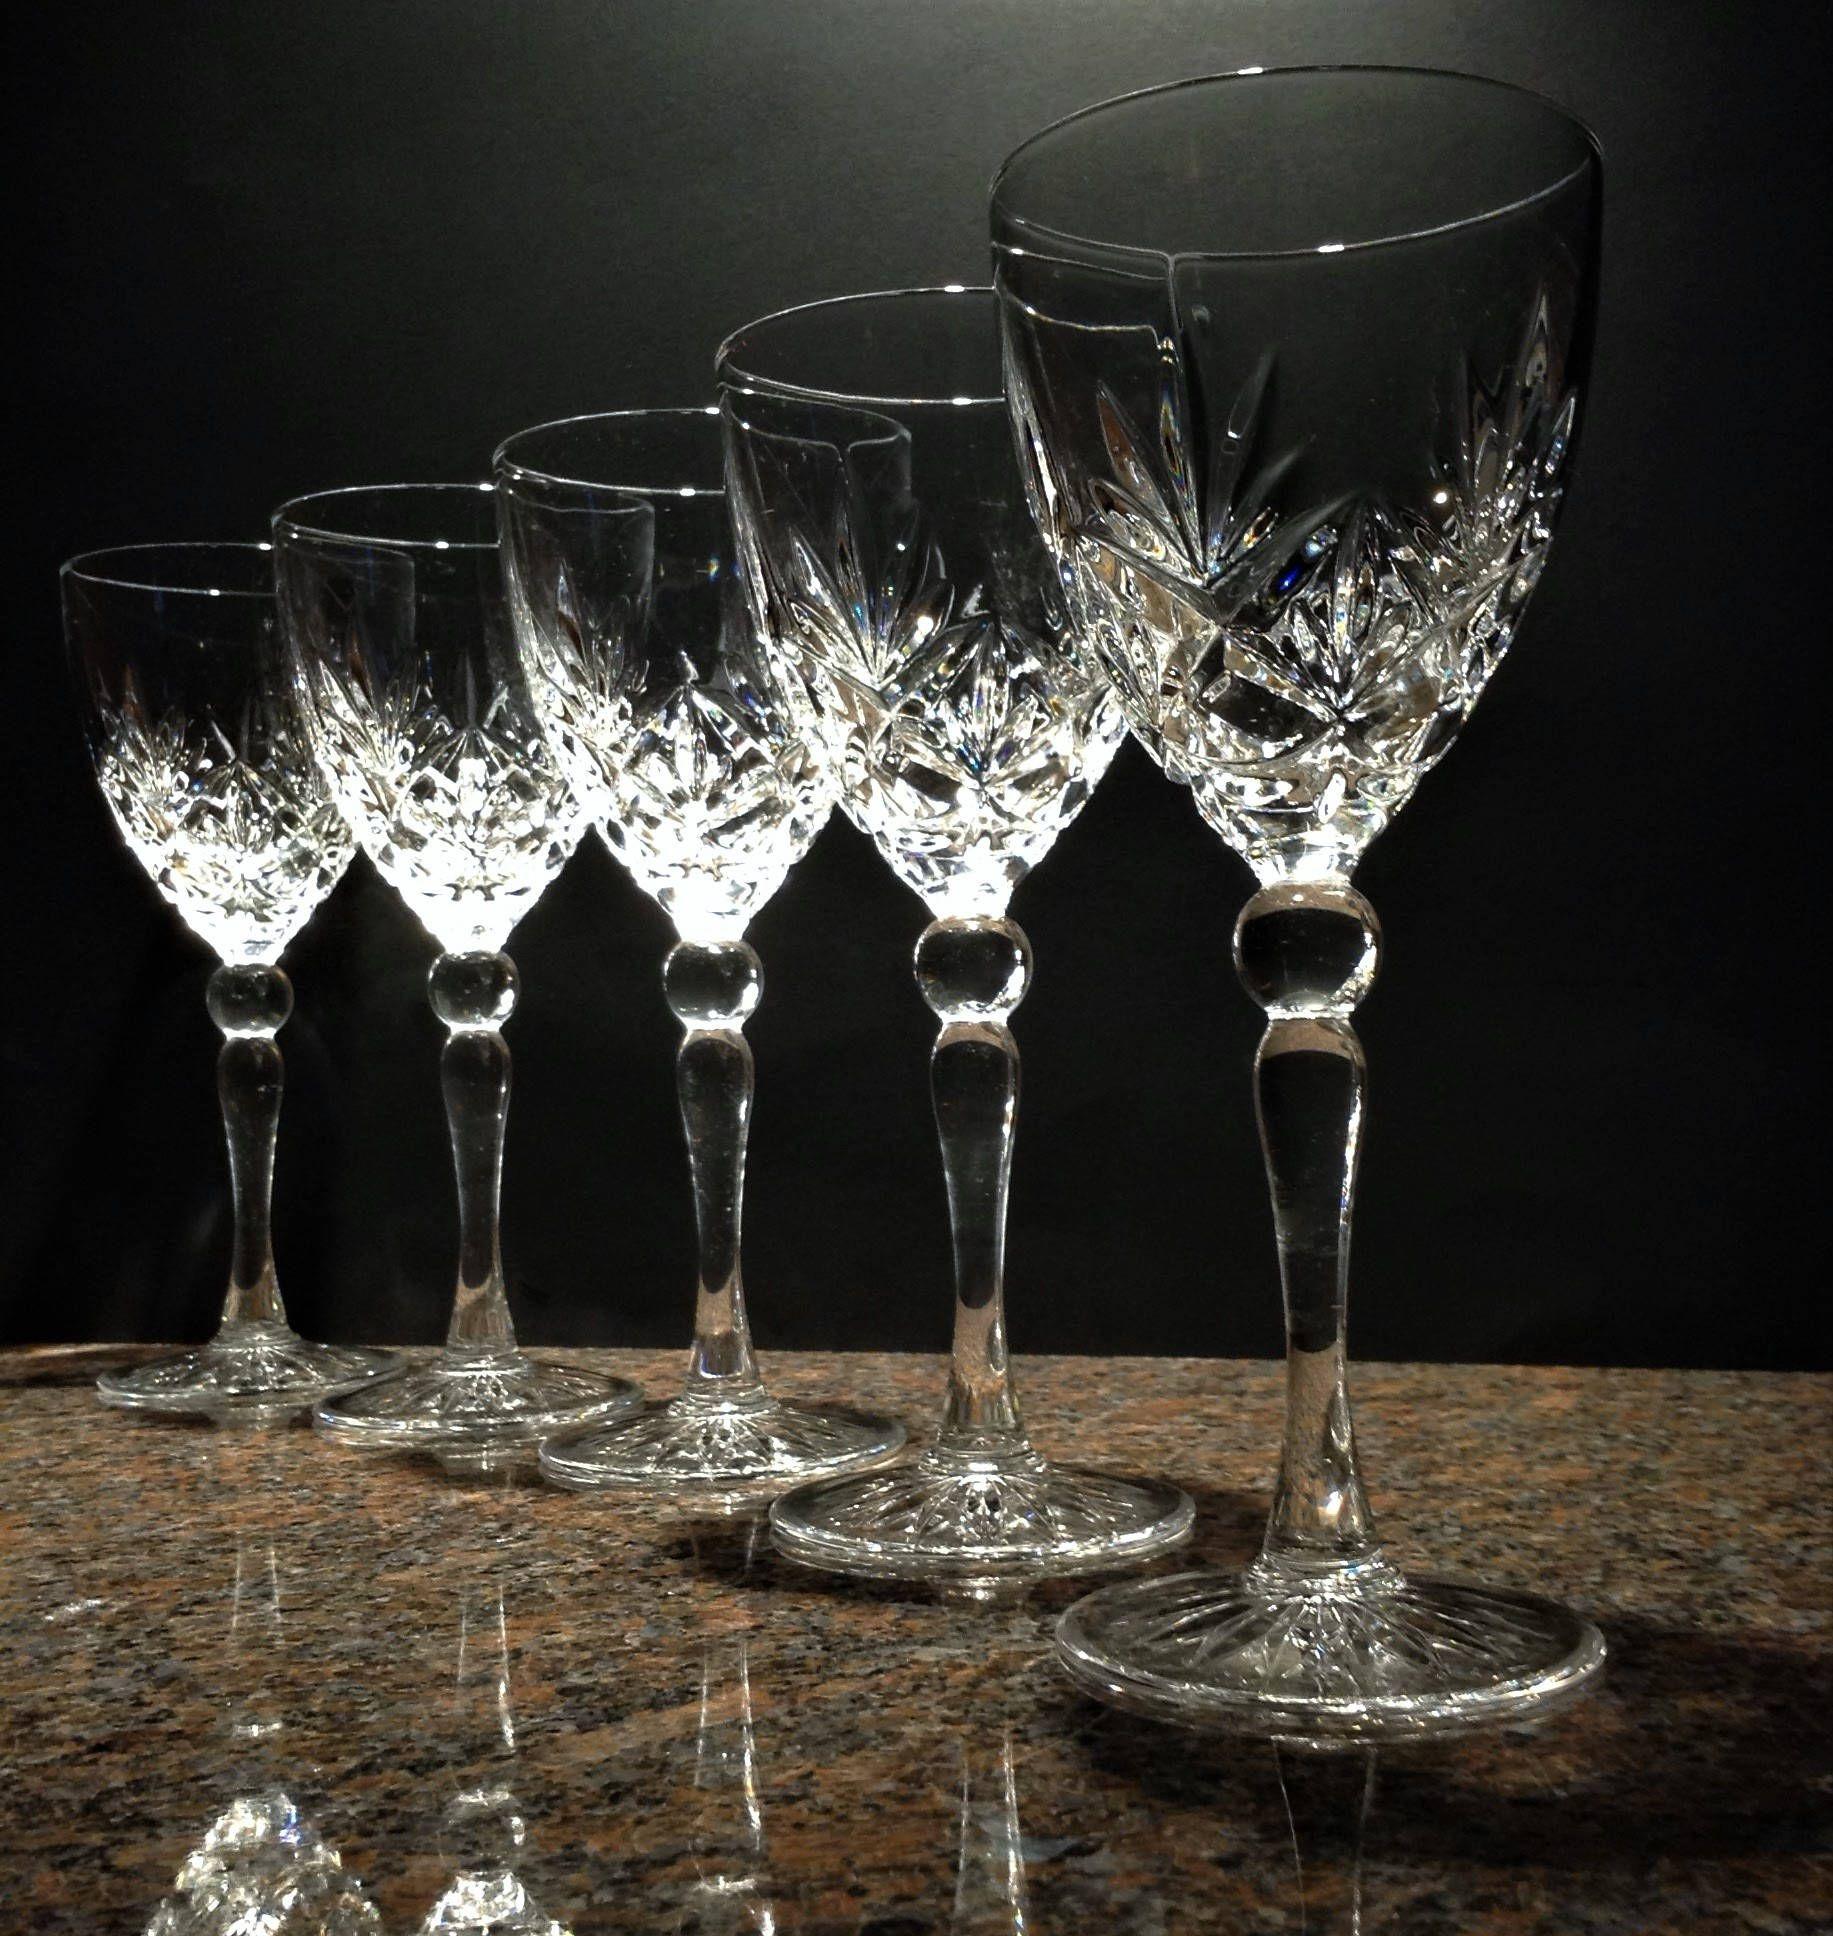 Crystal Wine Glasses Set Of 5 Mystique Cristal D Arques Durand Vintage Lead Crystal Glassware 7 Vintage Wine Glasses Crystal Glassware Crystal Wine Glasses